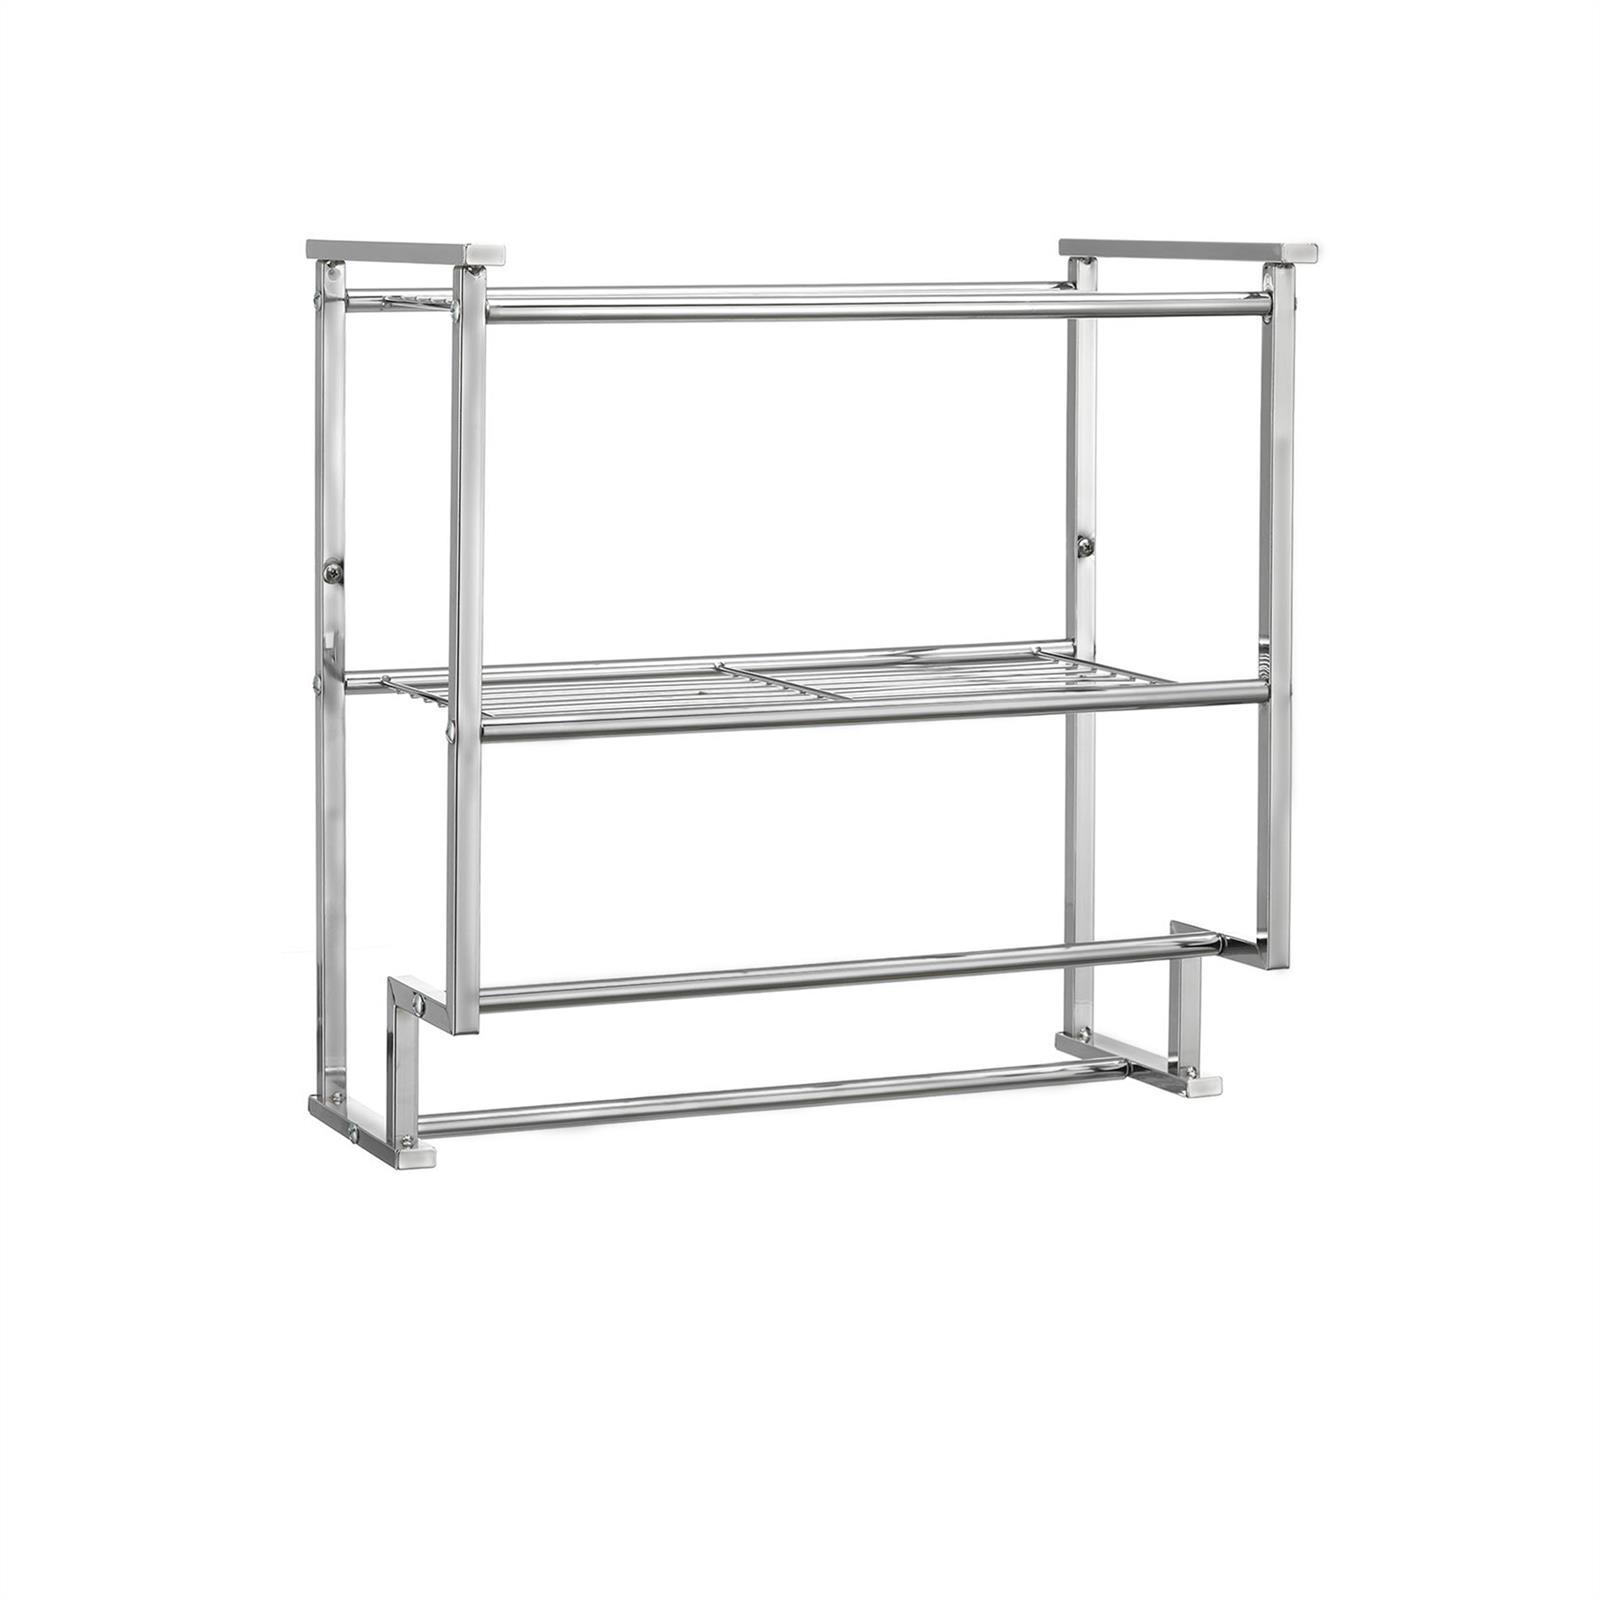 bad wandregal handtuchhalter h ngeregal 45 cm breit metall verchromt ebay. Black Bedroom Furniture Sets. Home Design Ideas